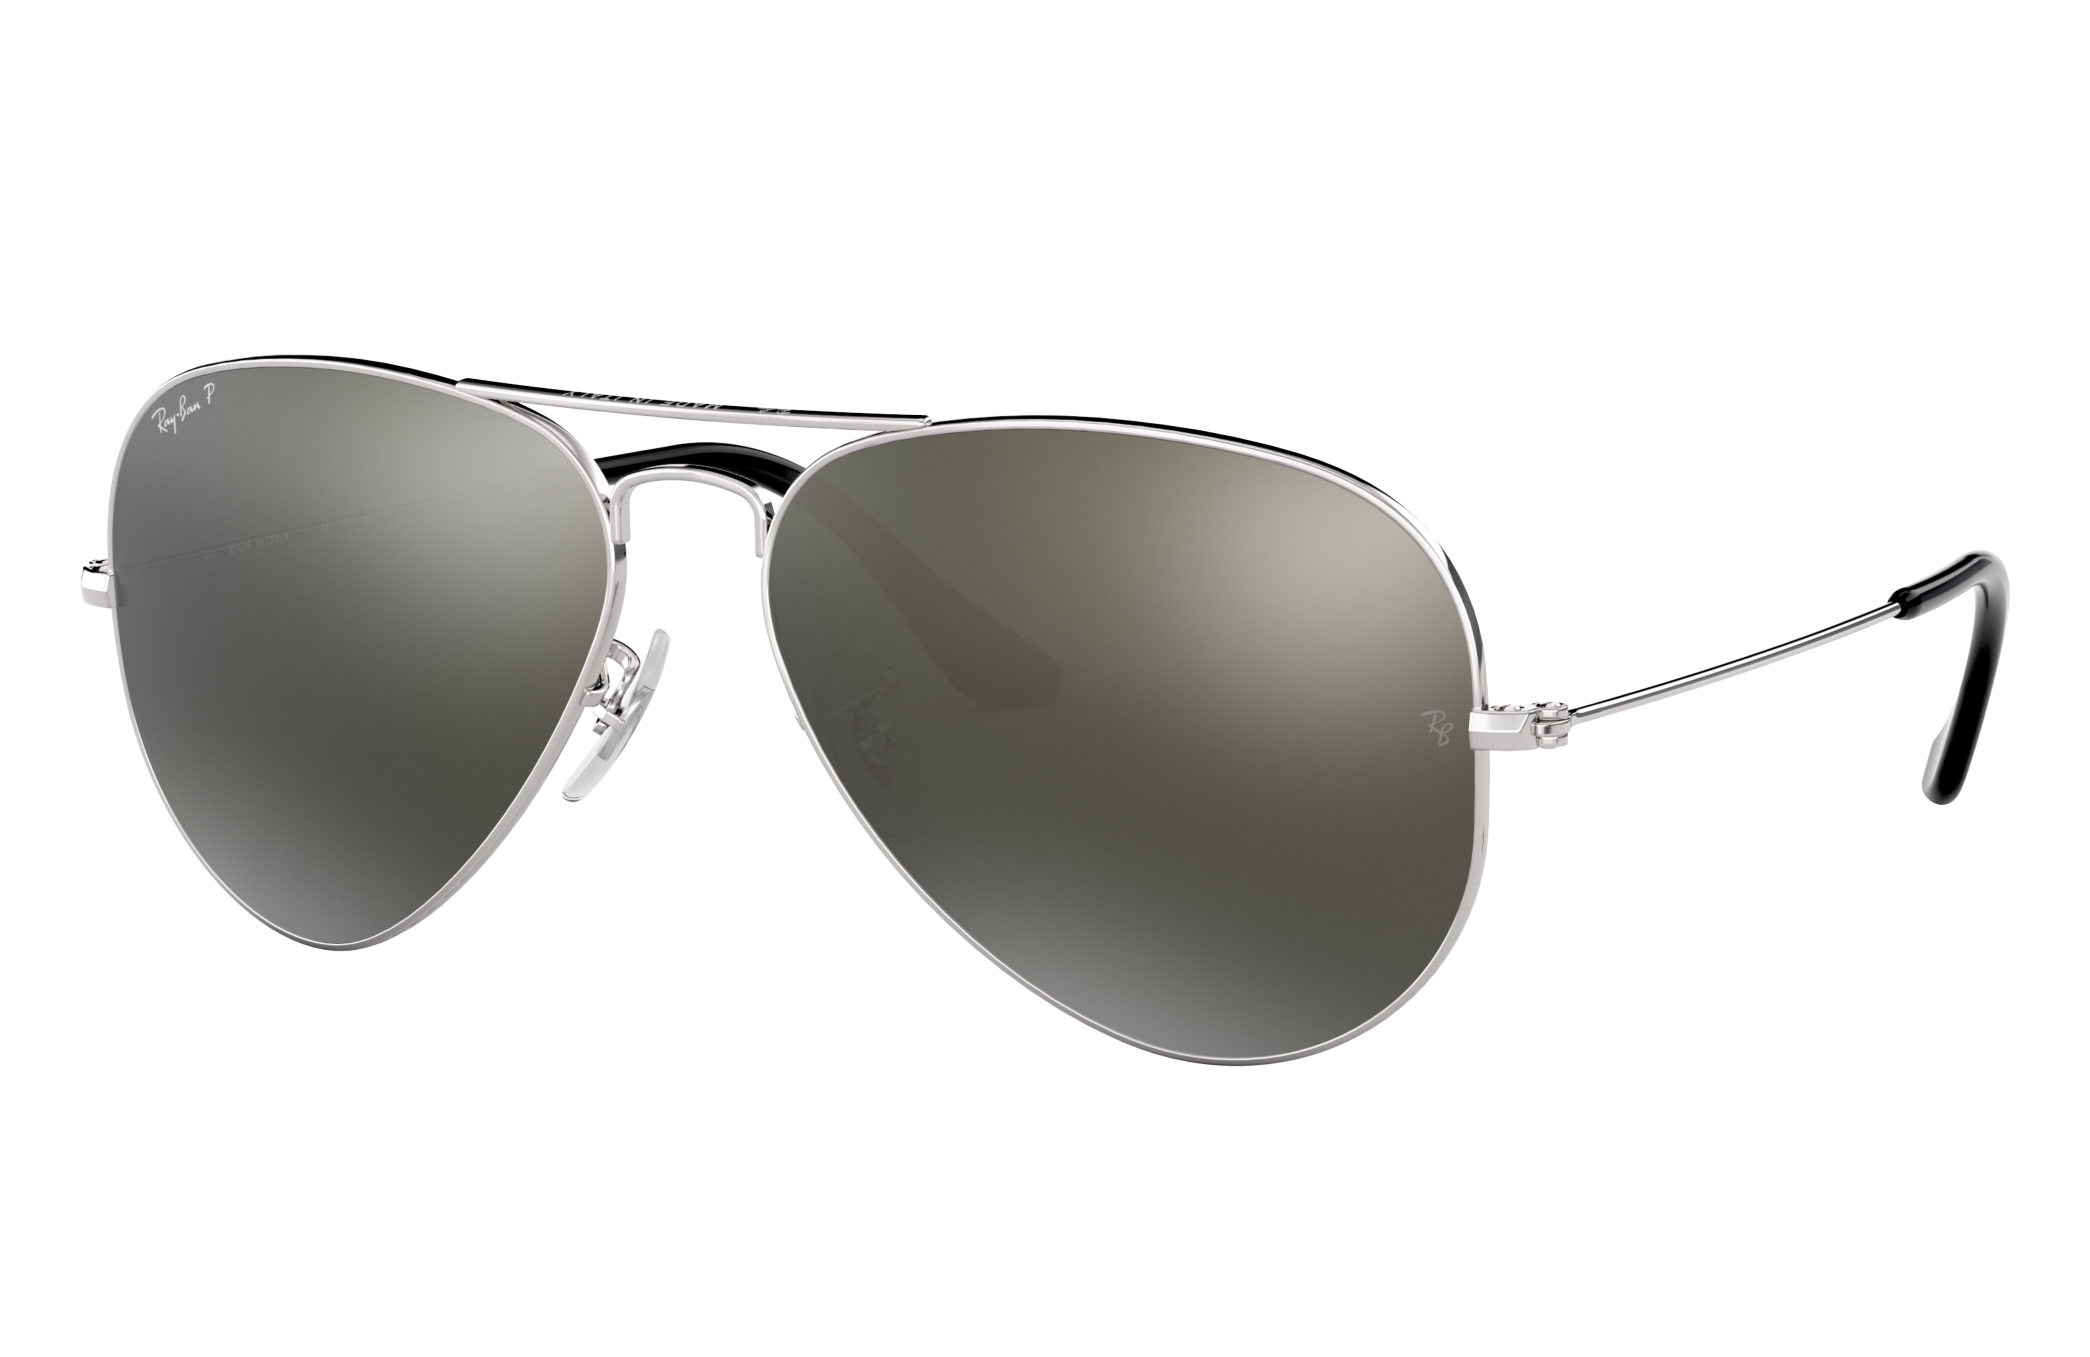 Ray-Ban Aviator Classic Silver, Polarized Gray Lenses - RB3025